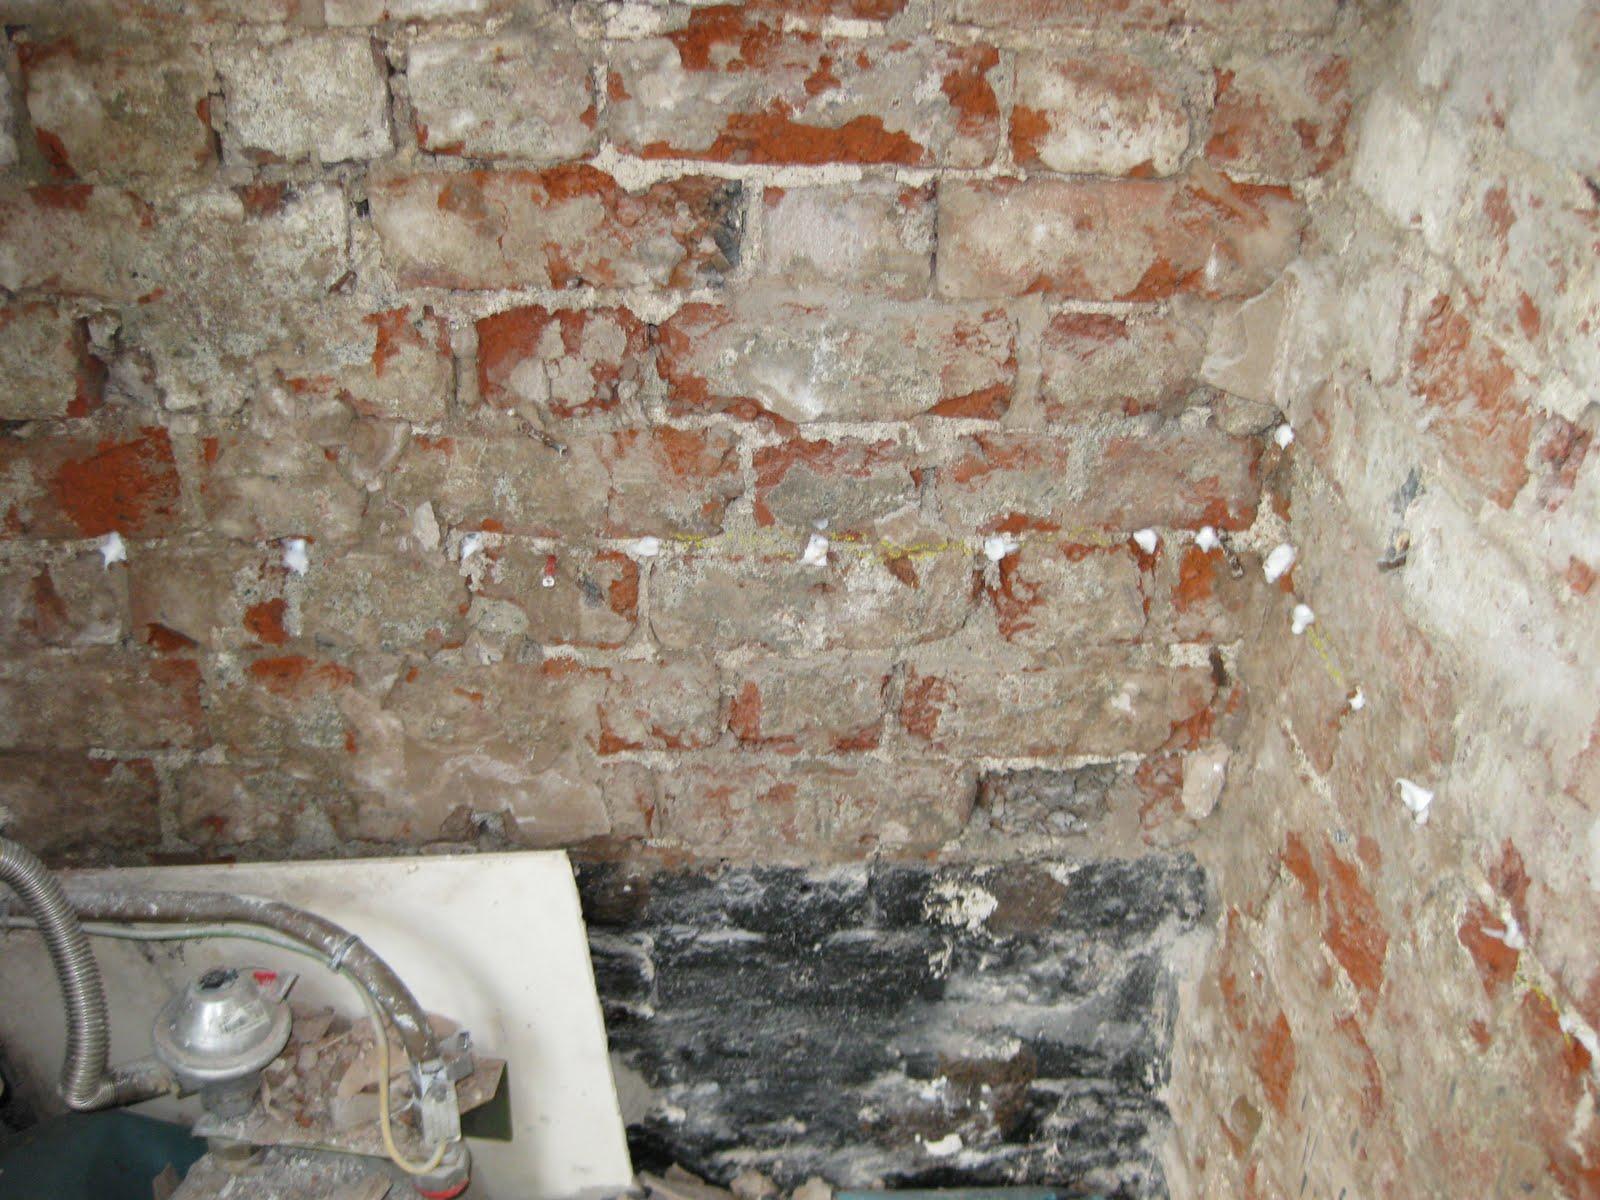 http://3.bp.blogspot.com/_TWdoNYROwMk/S_HAkekCQXI/AAAAAAAAAIE/1a27kFzI6iU/s1600/Haddef+repairs+-+Day+13+(1)+damp+proof+course.jpg